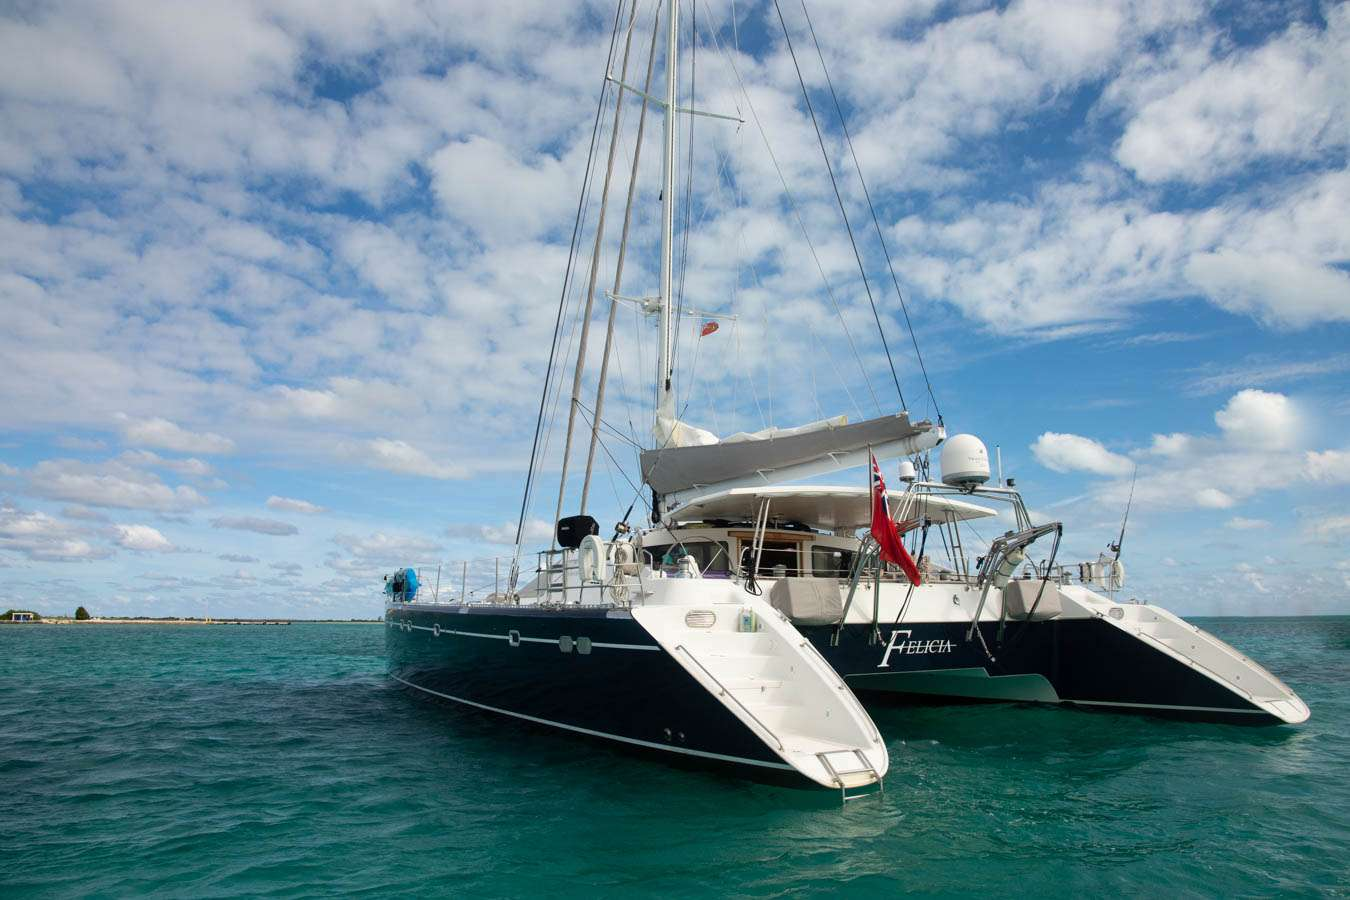 Sail Ionian Yacht Felicia